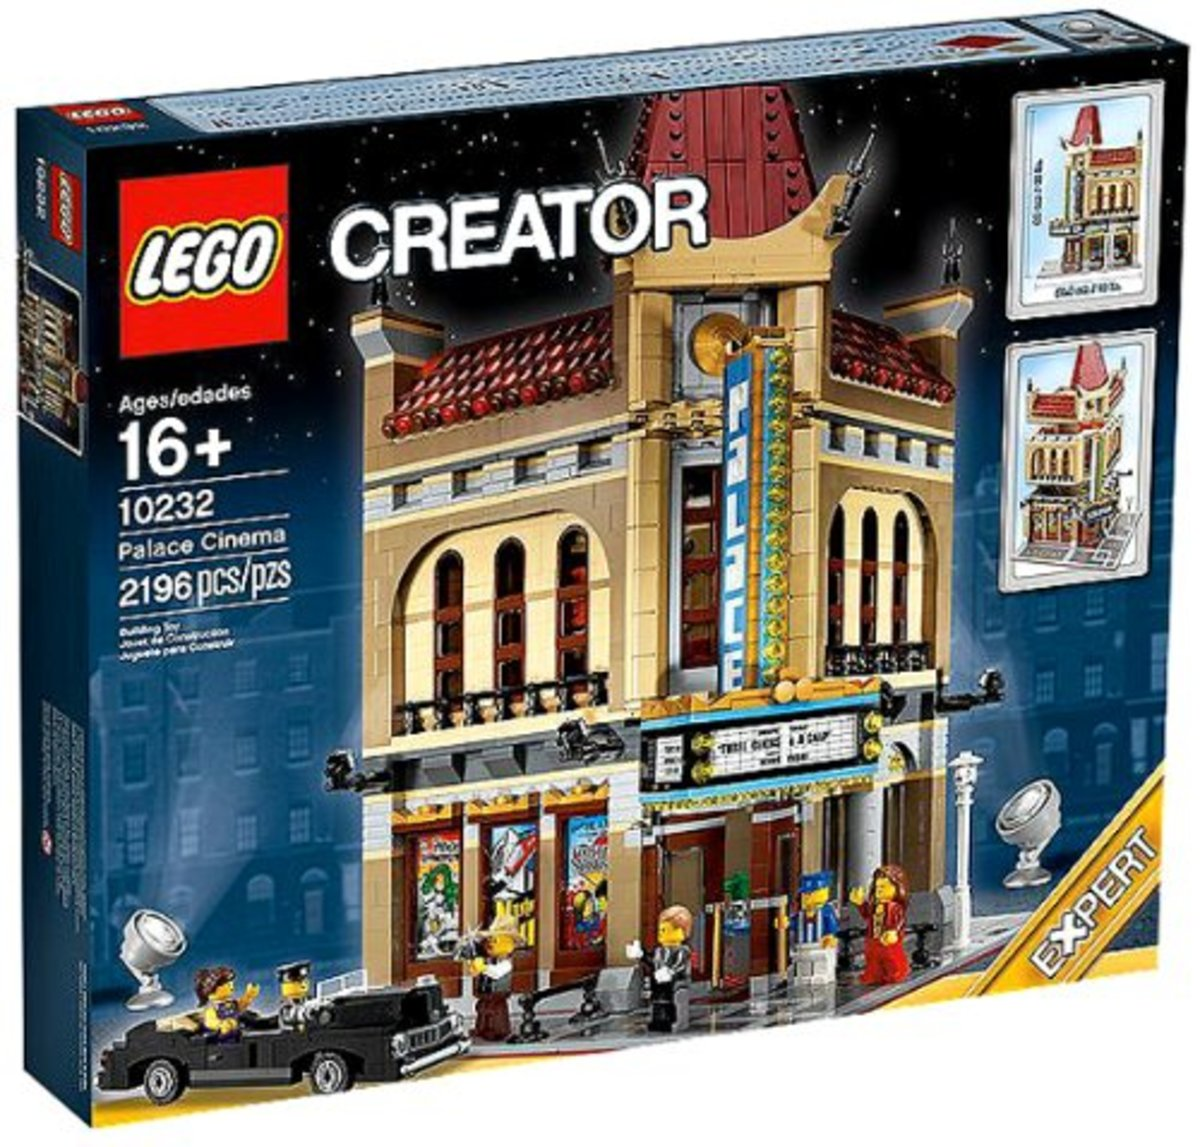 LEGO Creator Palace Cinema Modular Building